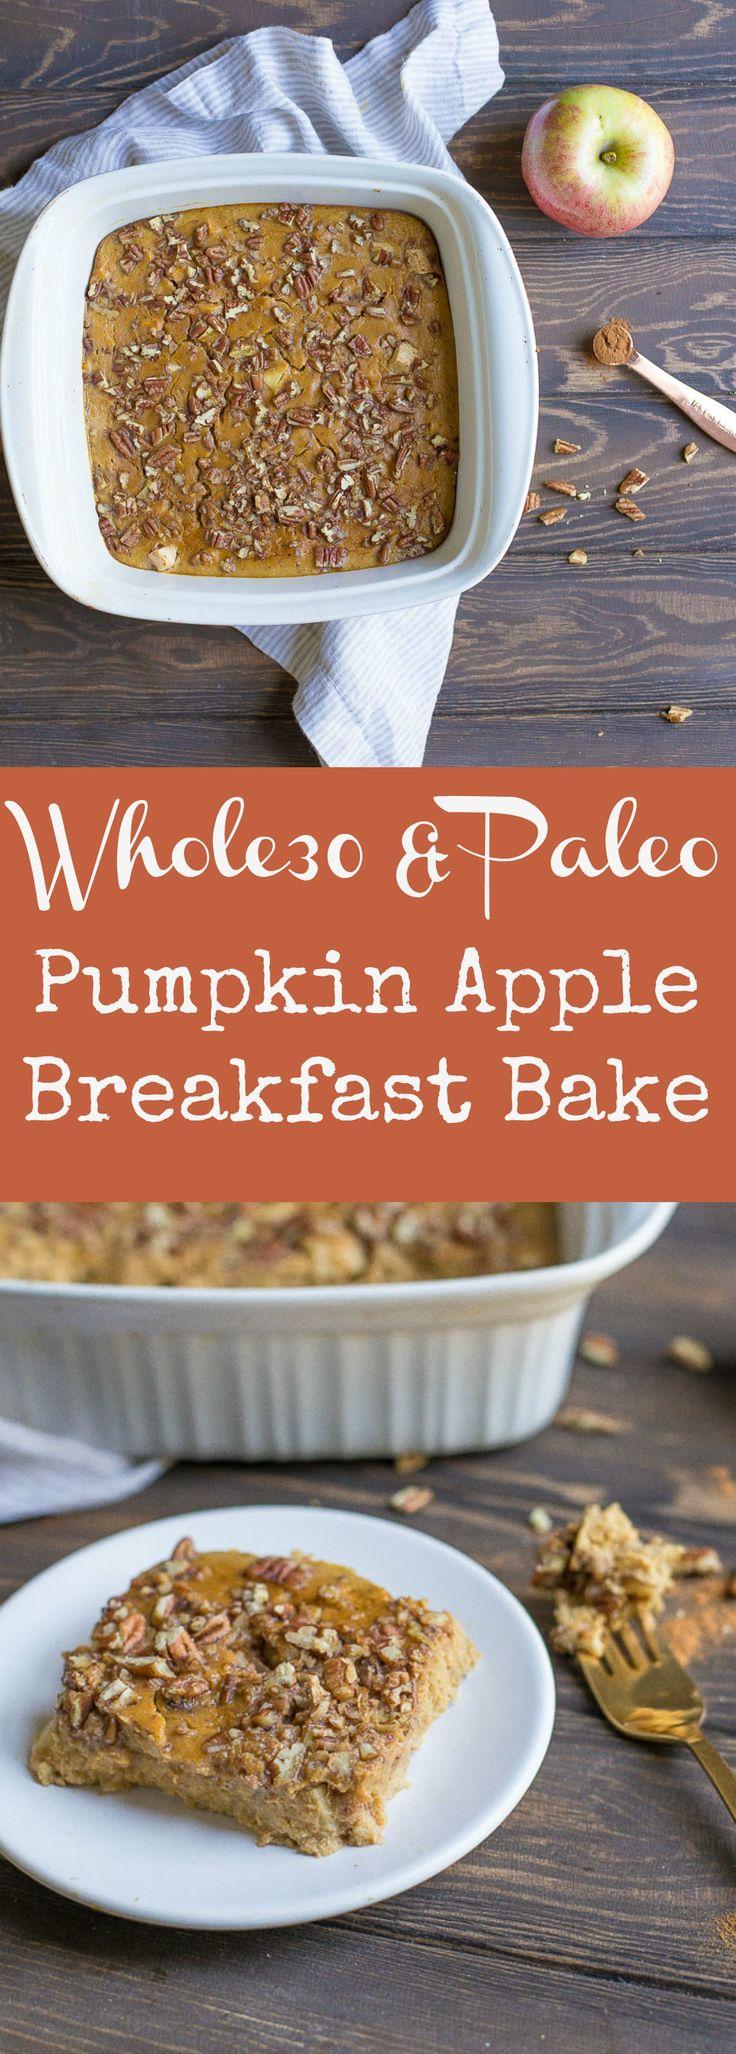 Best 25+ Healthy recipes ideas on Pinterest | Baked dinner ...